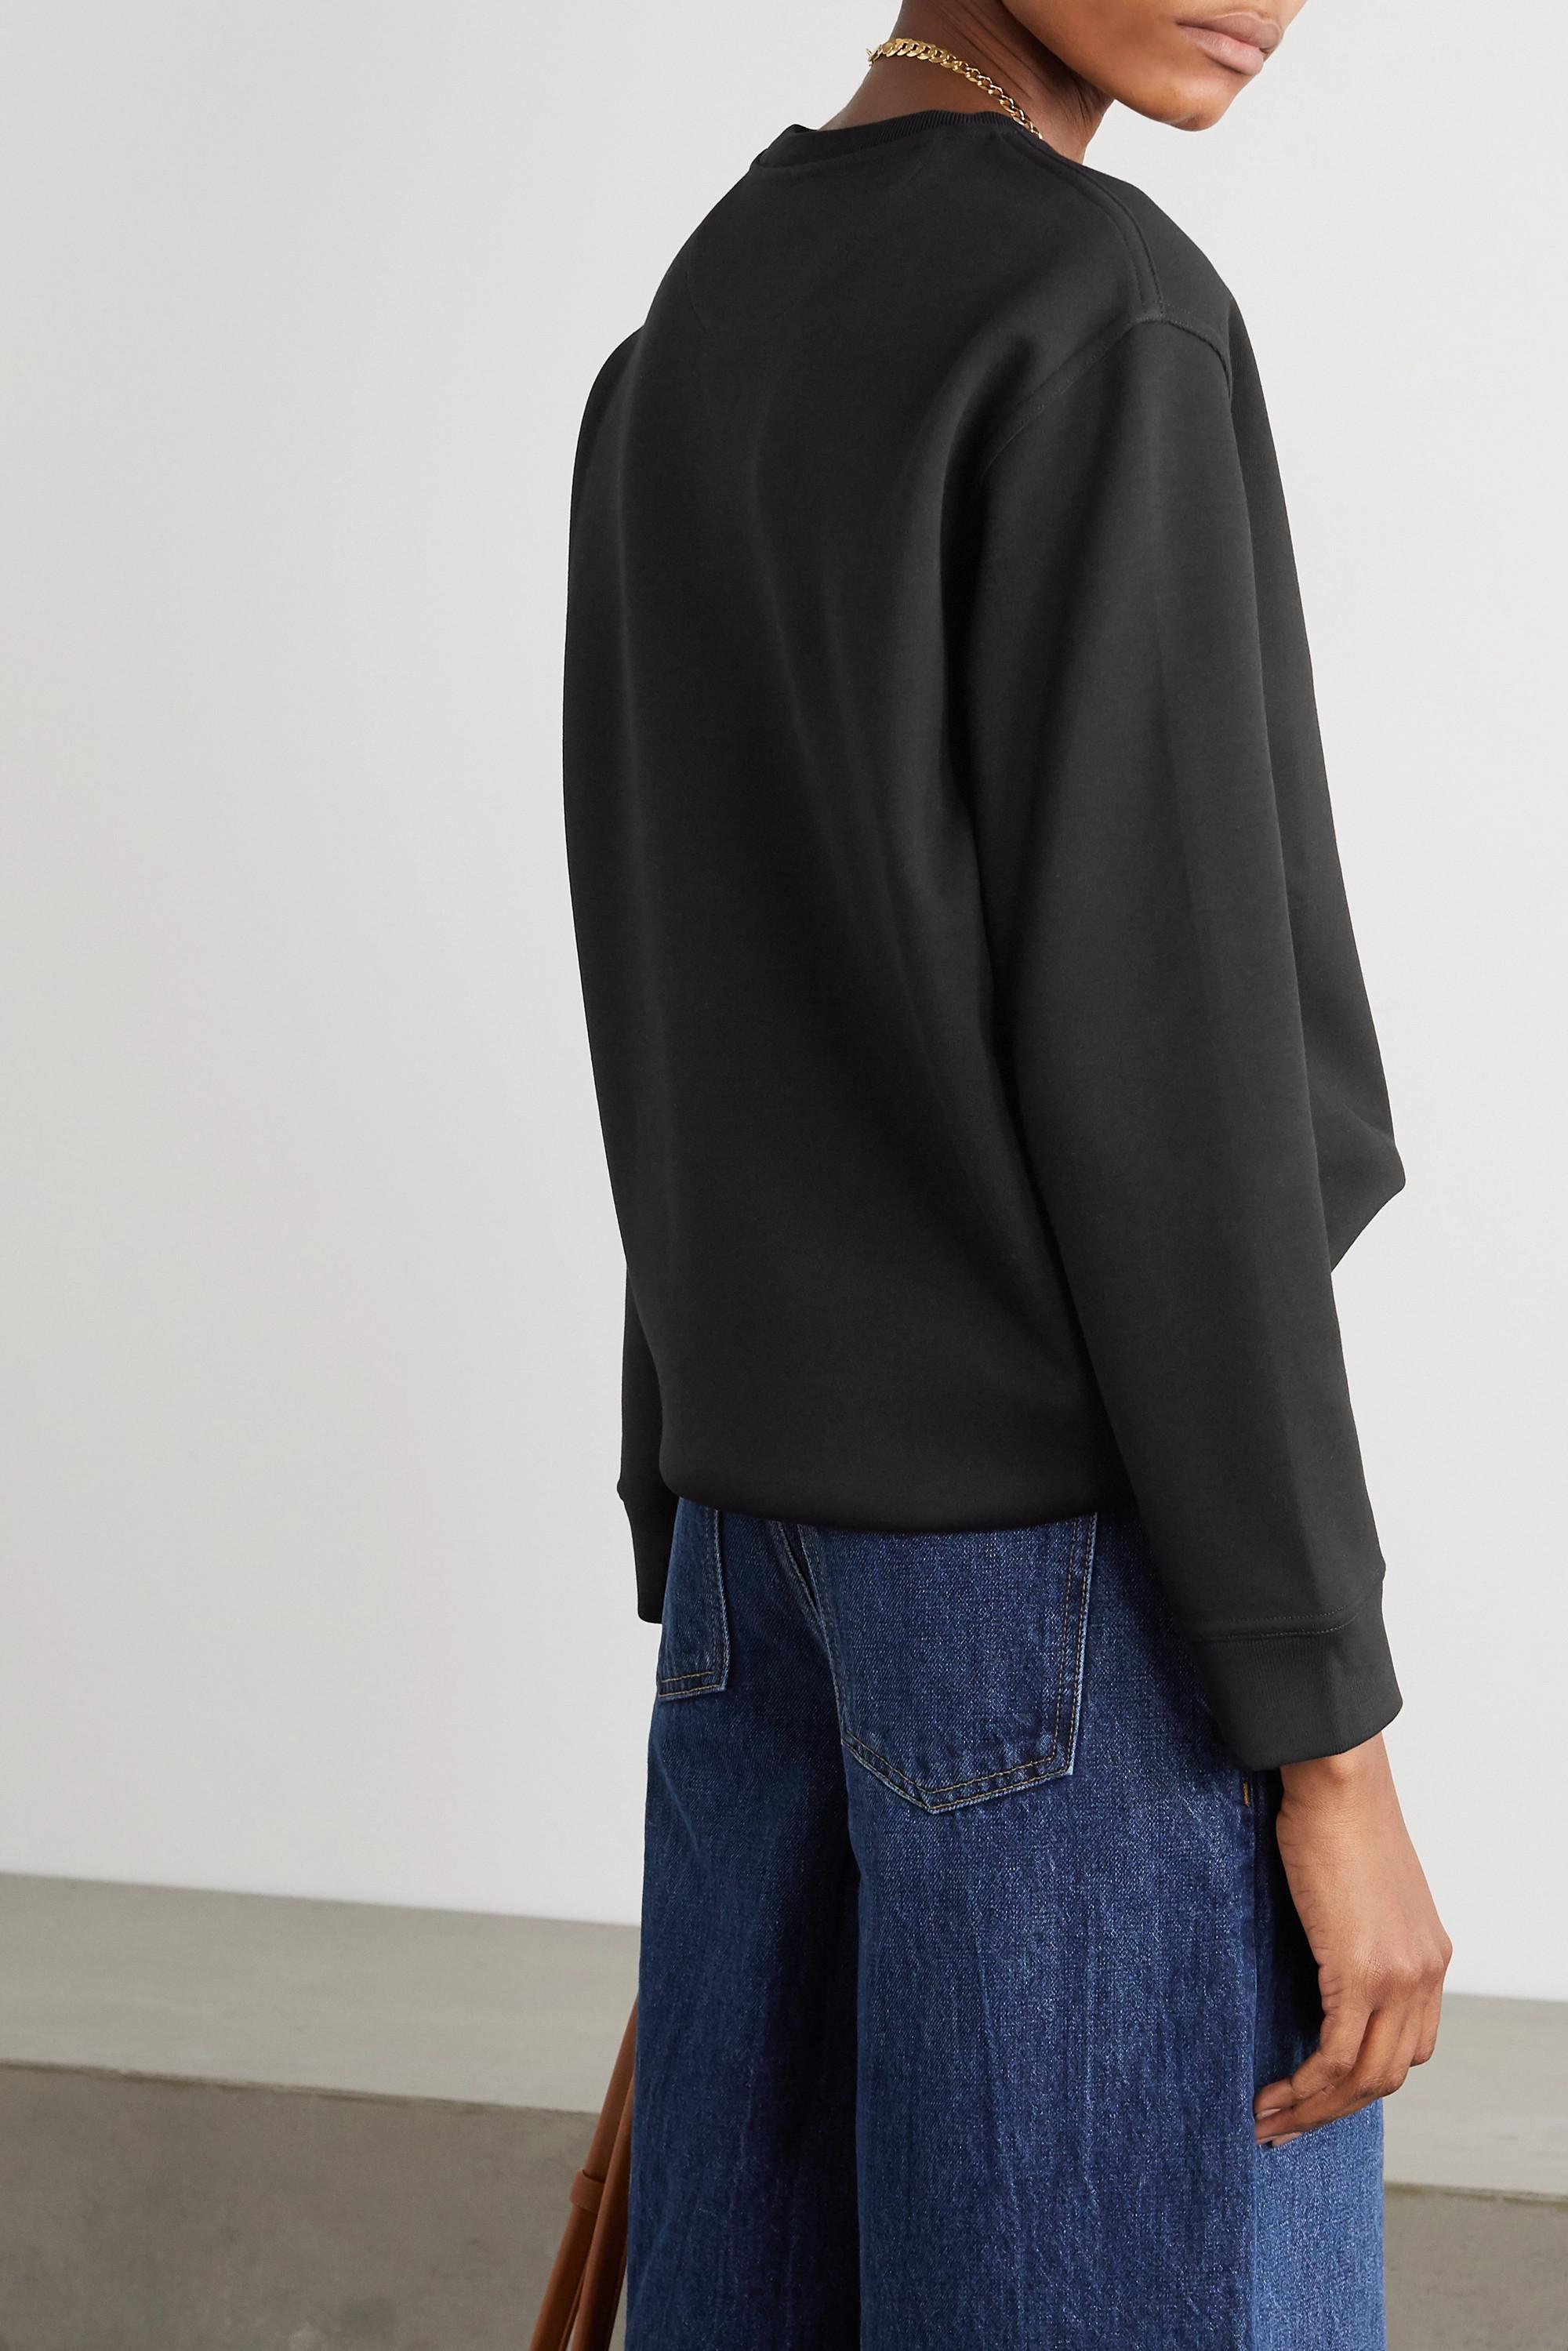 Valentino Printed cotton-blend jersey sweatshirt